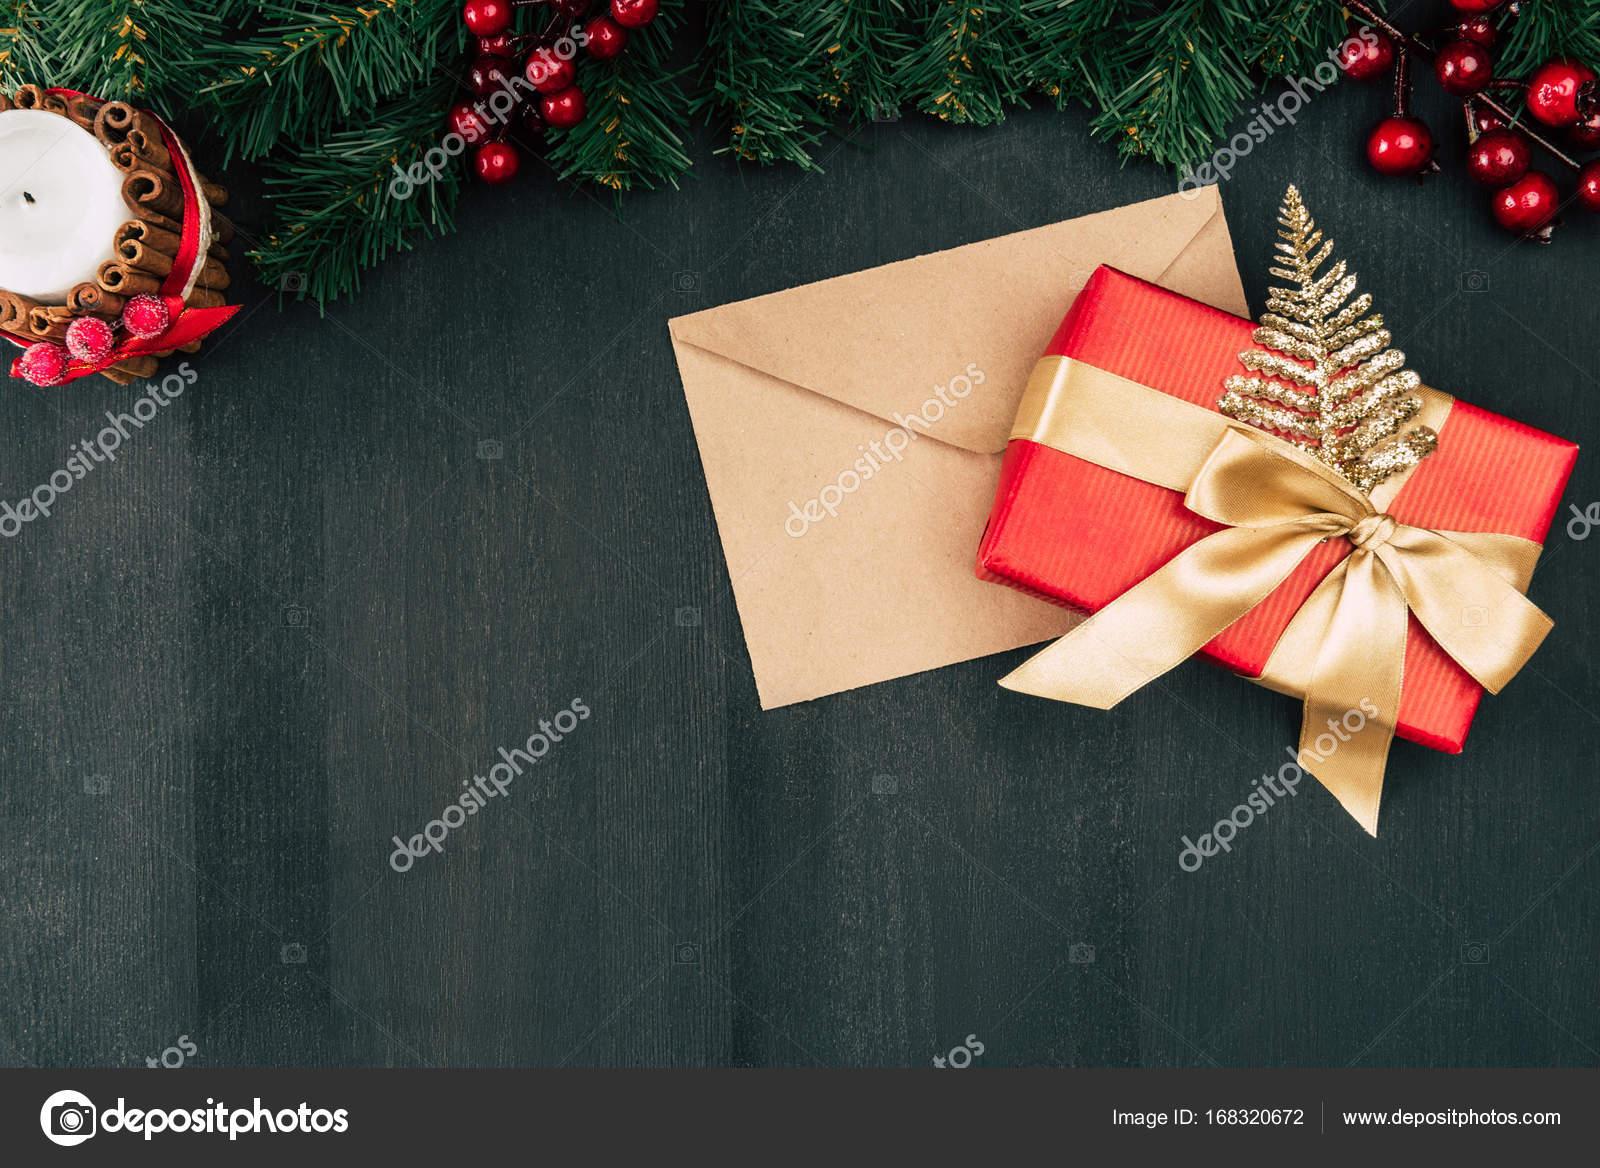 Enveloppe et cadeau de no l photographie edzbarzhyvetsky 168320672 - Enveloppe de noel ...